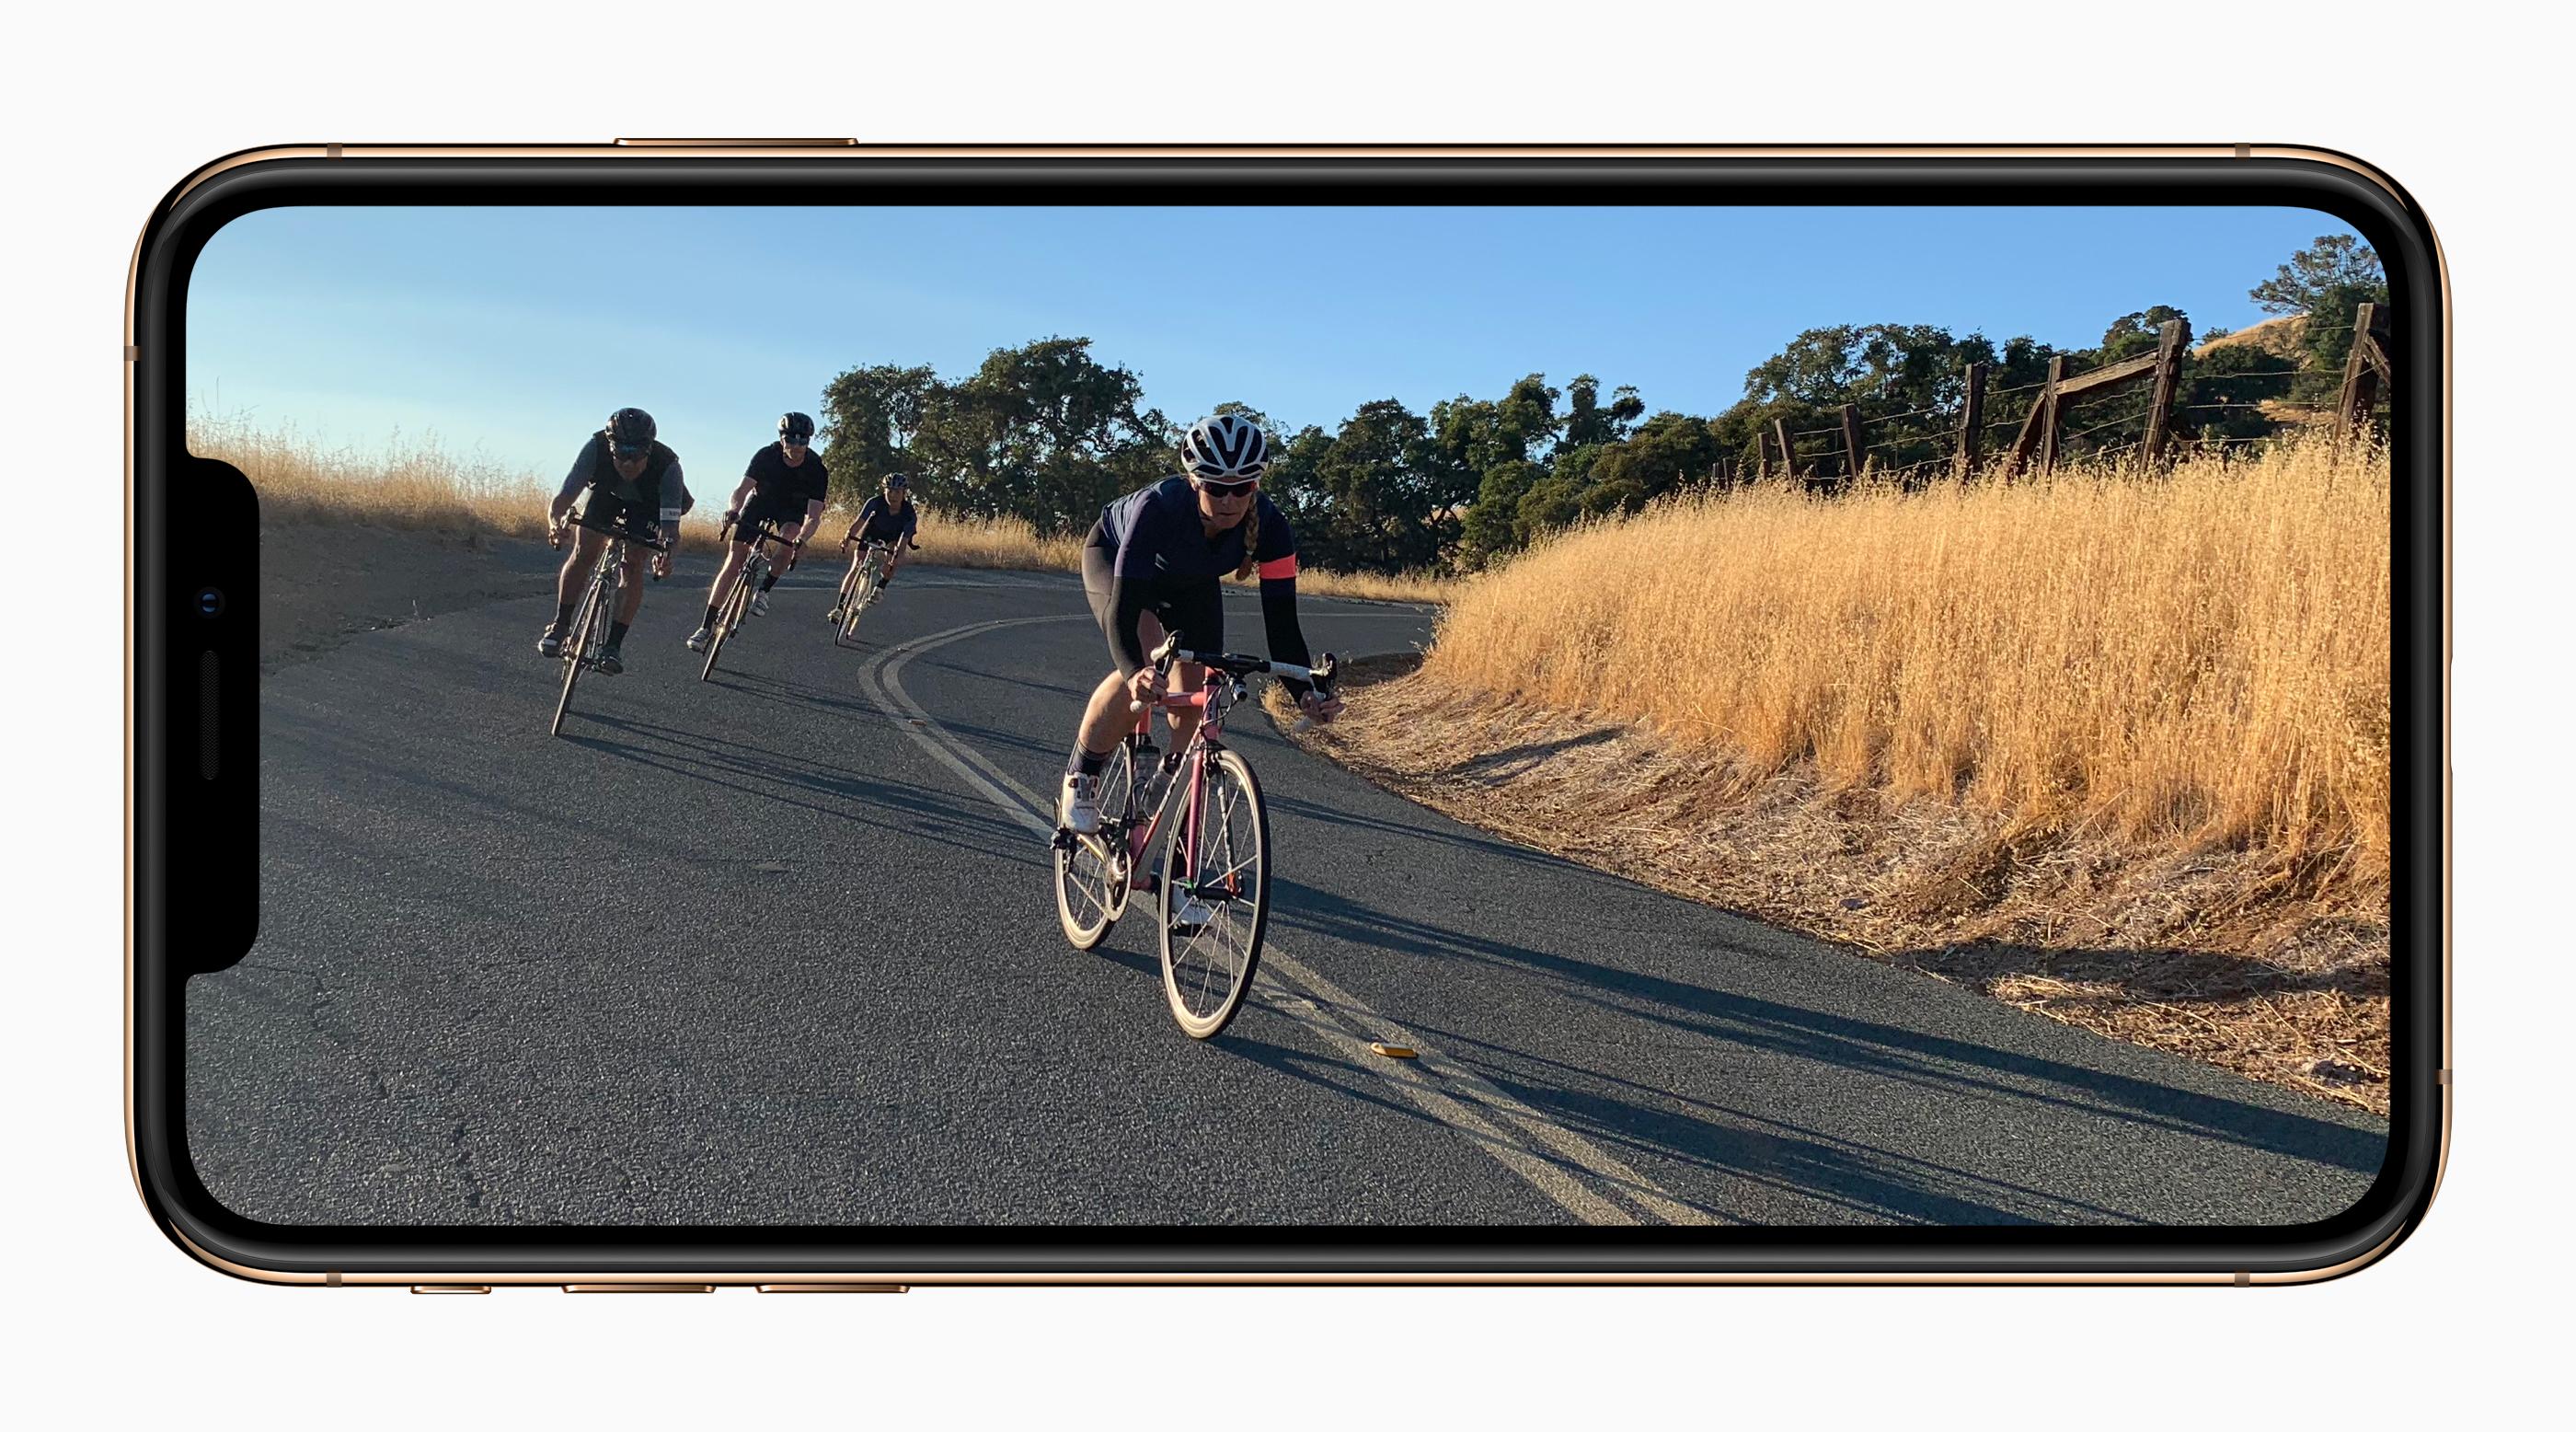 apple iphone Xs gold video capture screen